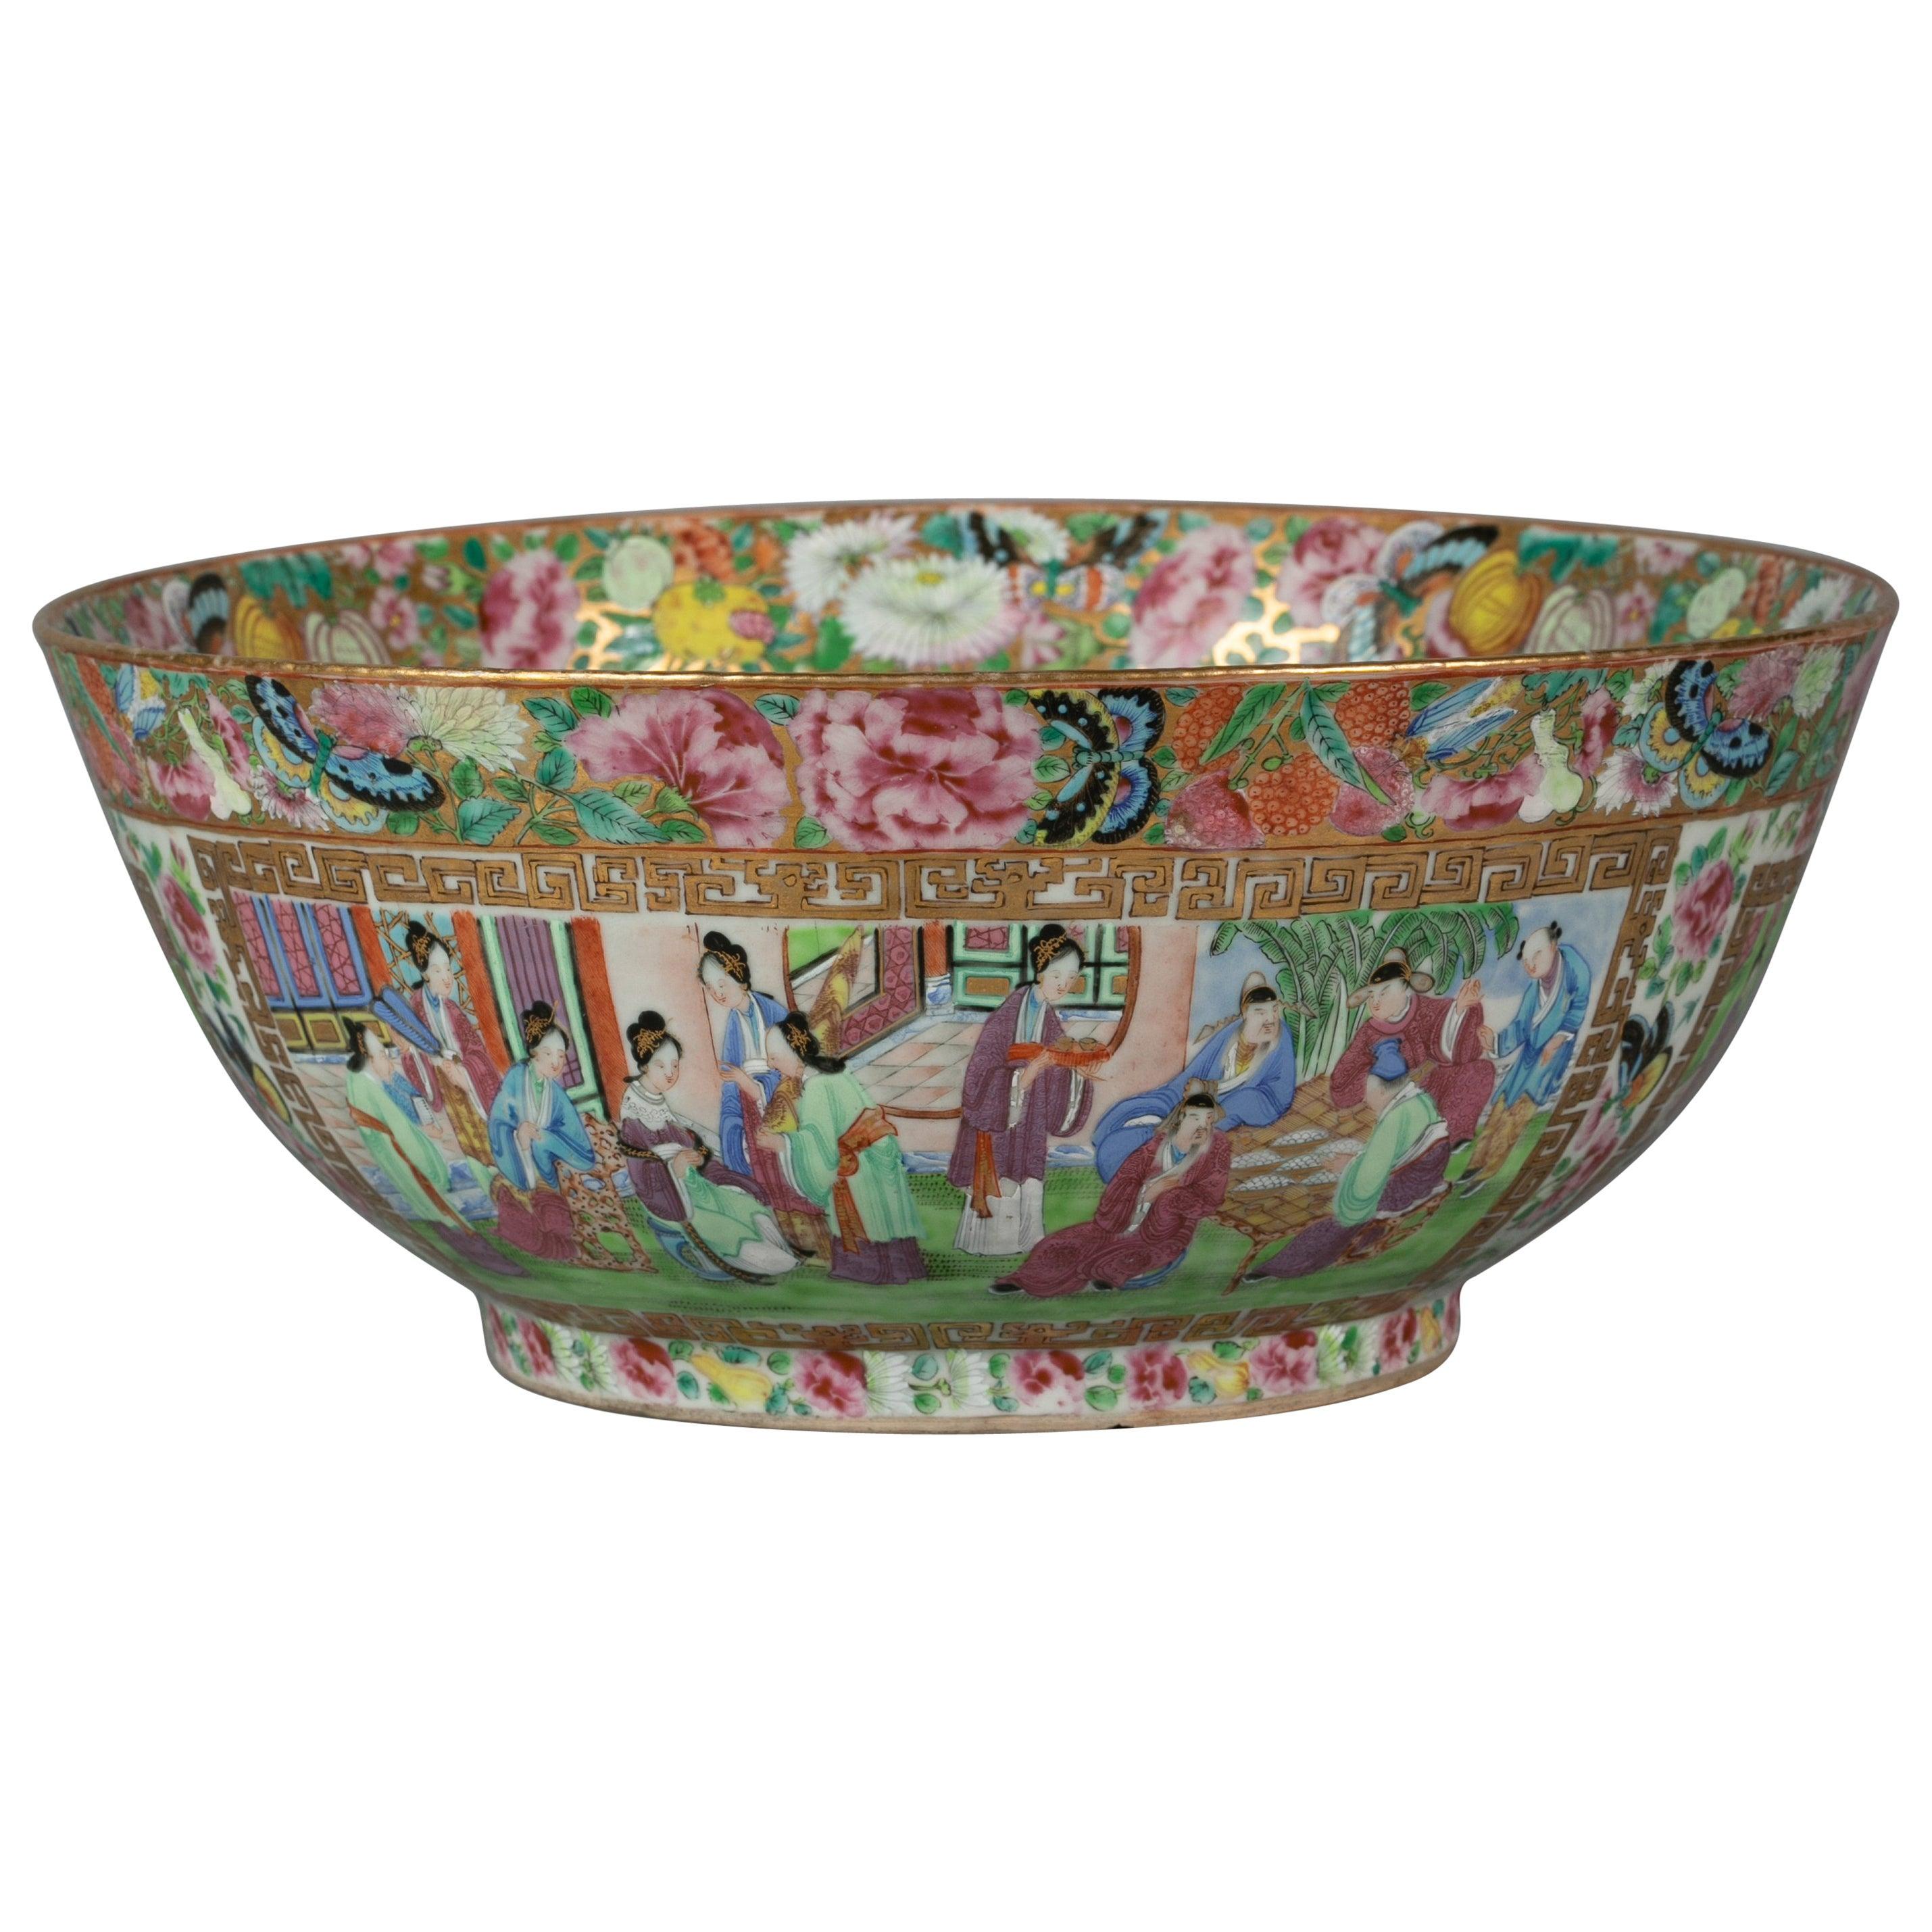 Chinese Export Rose Mandarin Porcelain Bowl, circa 1820